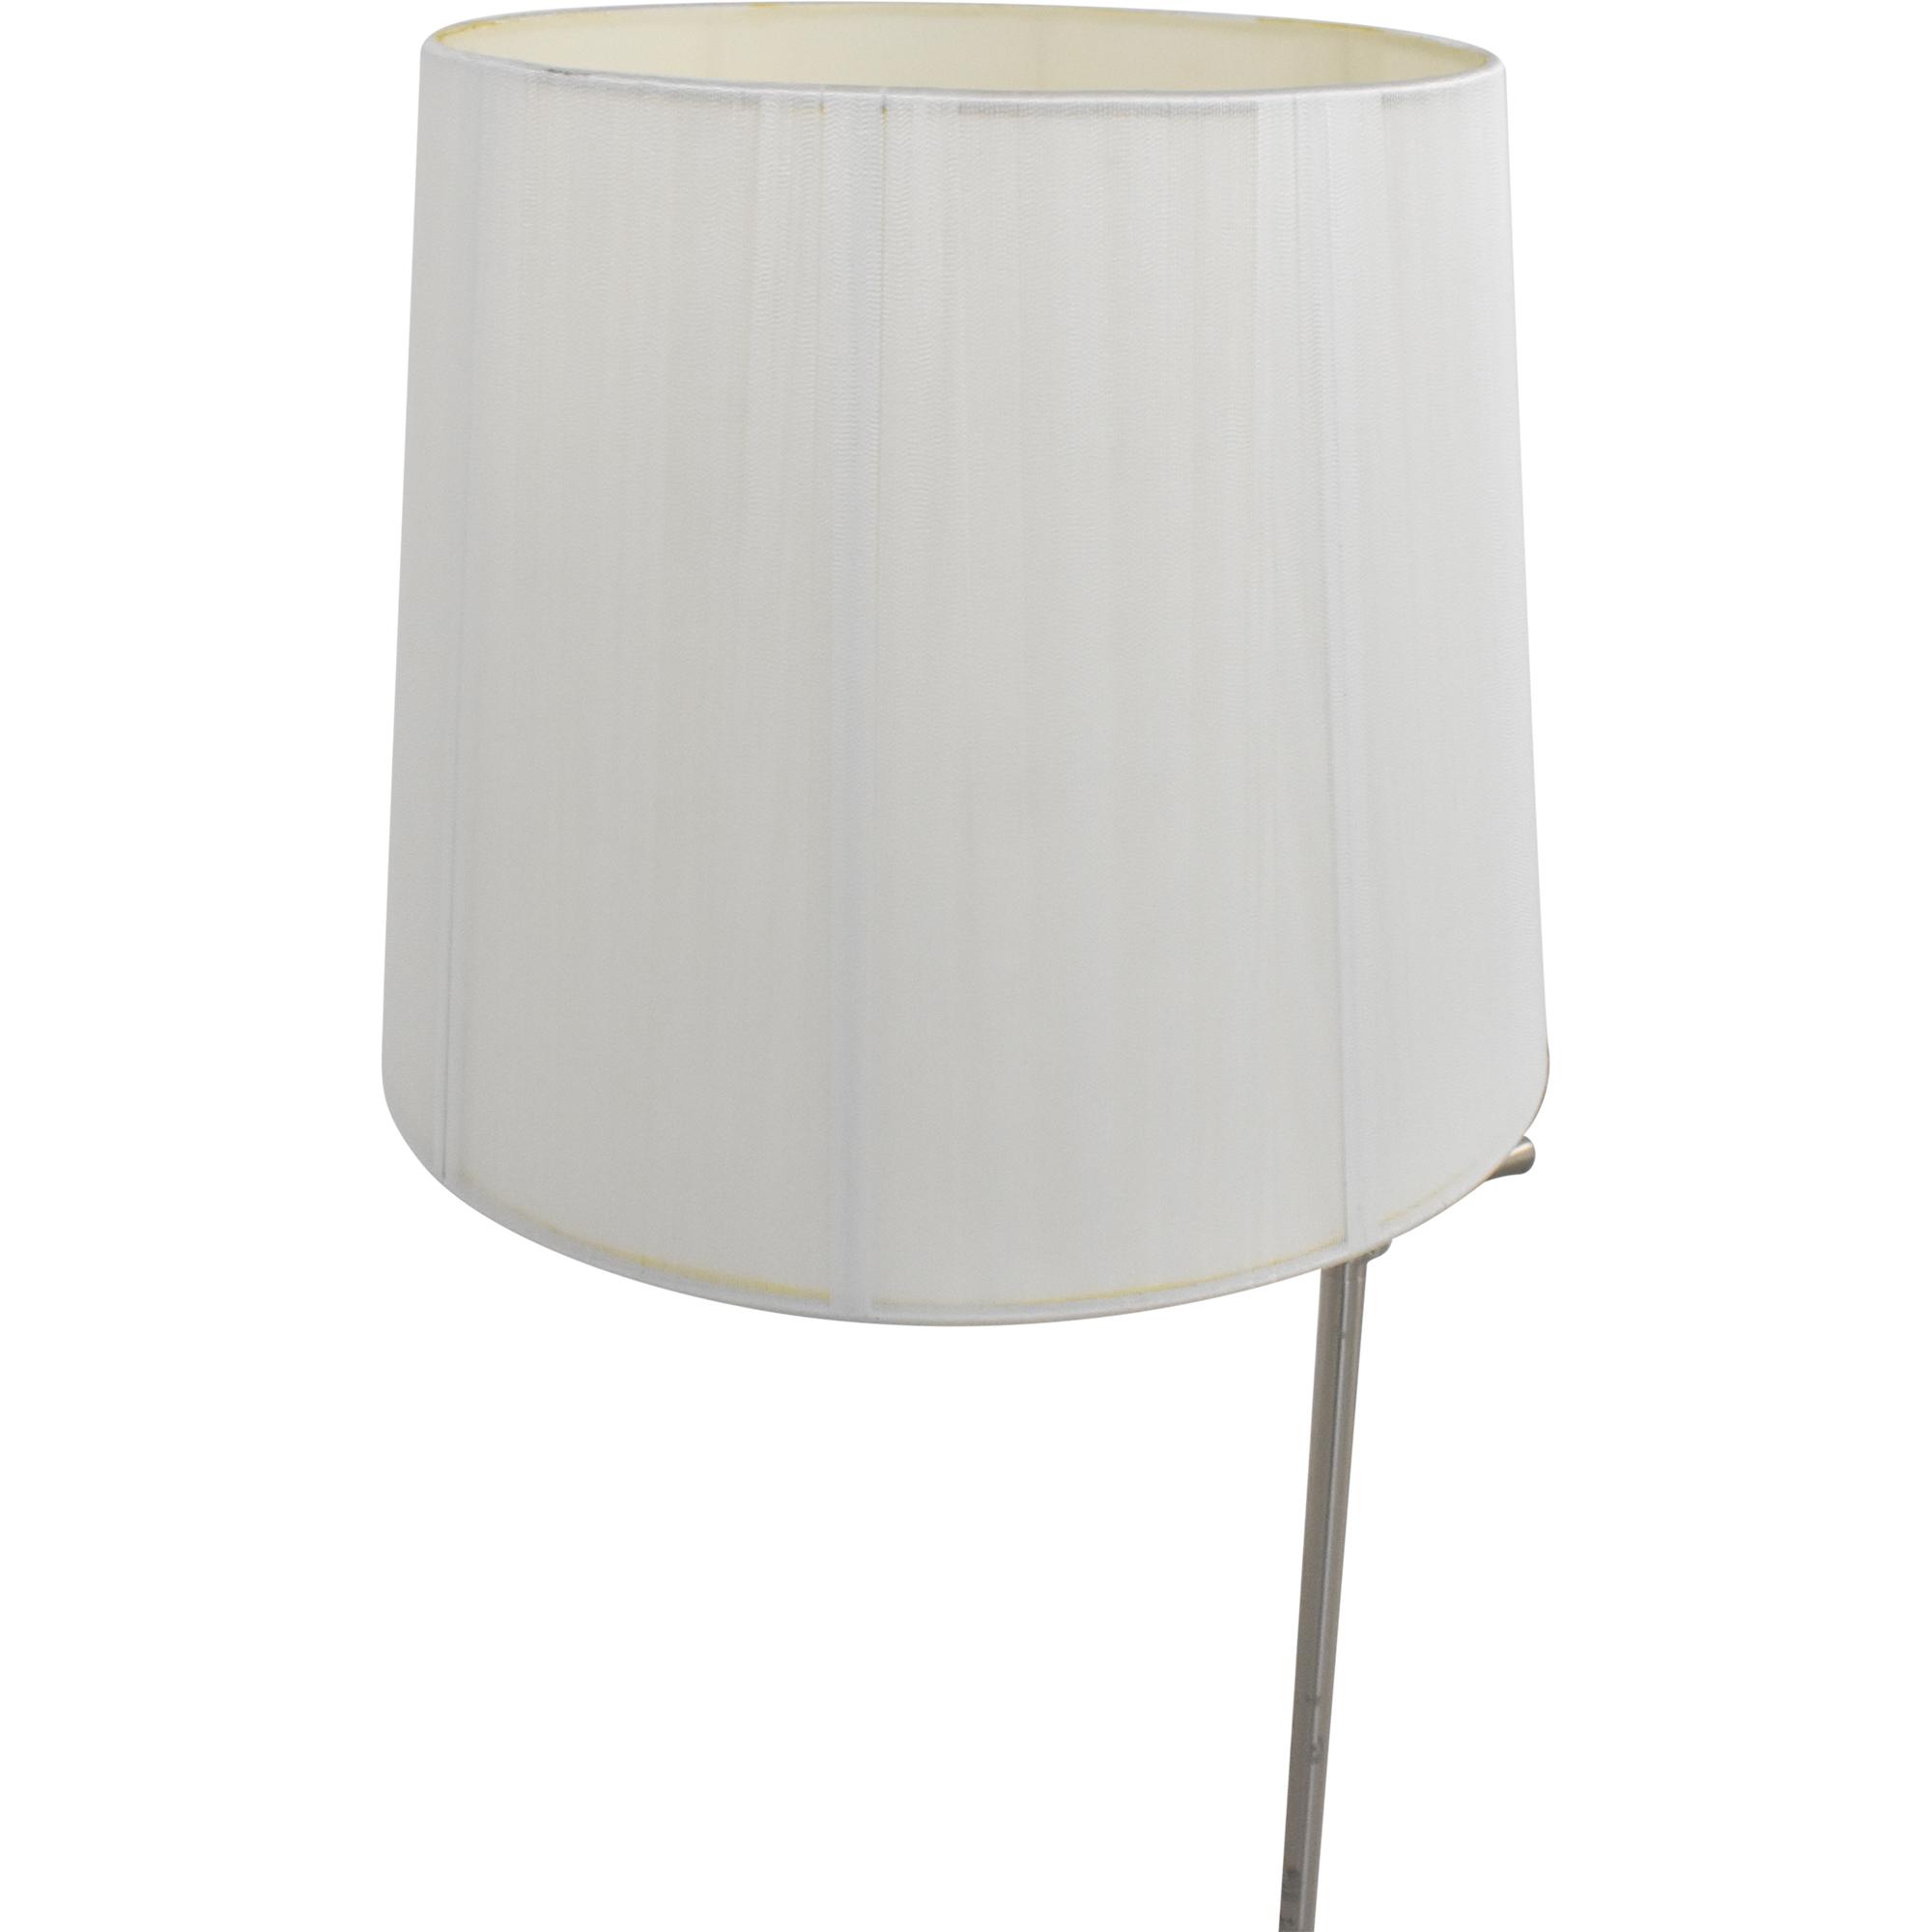 Gracious Home Swing Arm Floor Lamp sale